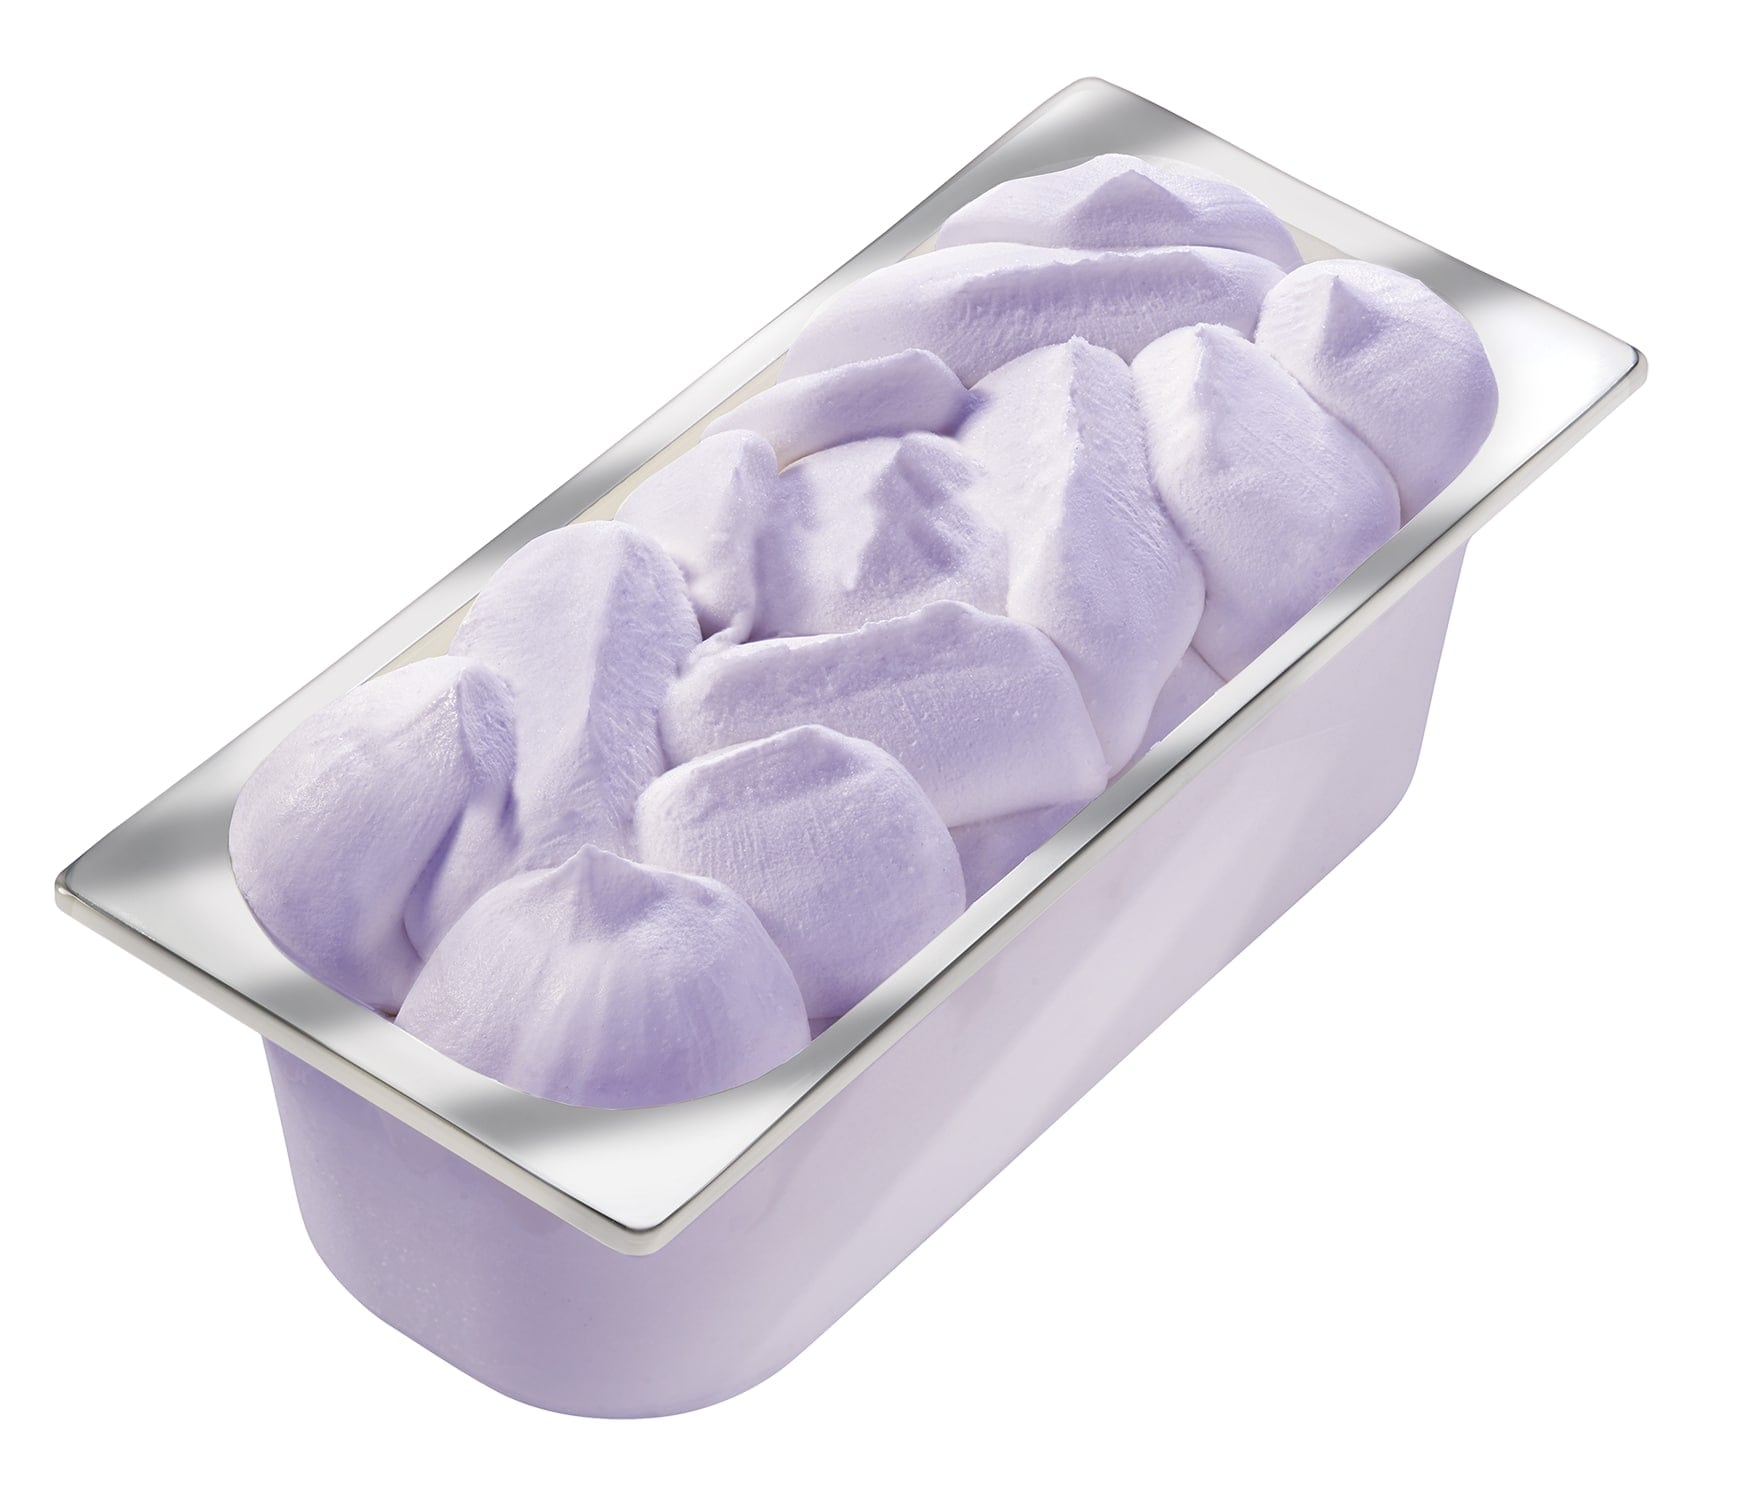 Carte D'Or Замороженный десерт Лаванда-ежевика (3000 г) - Изысканный лавандовый десерт с нежным пюре ежевики.